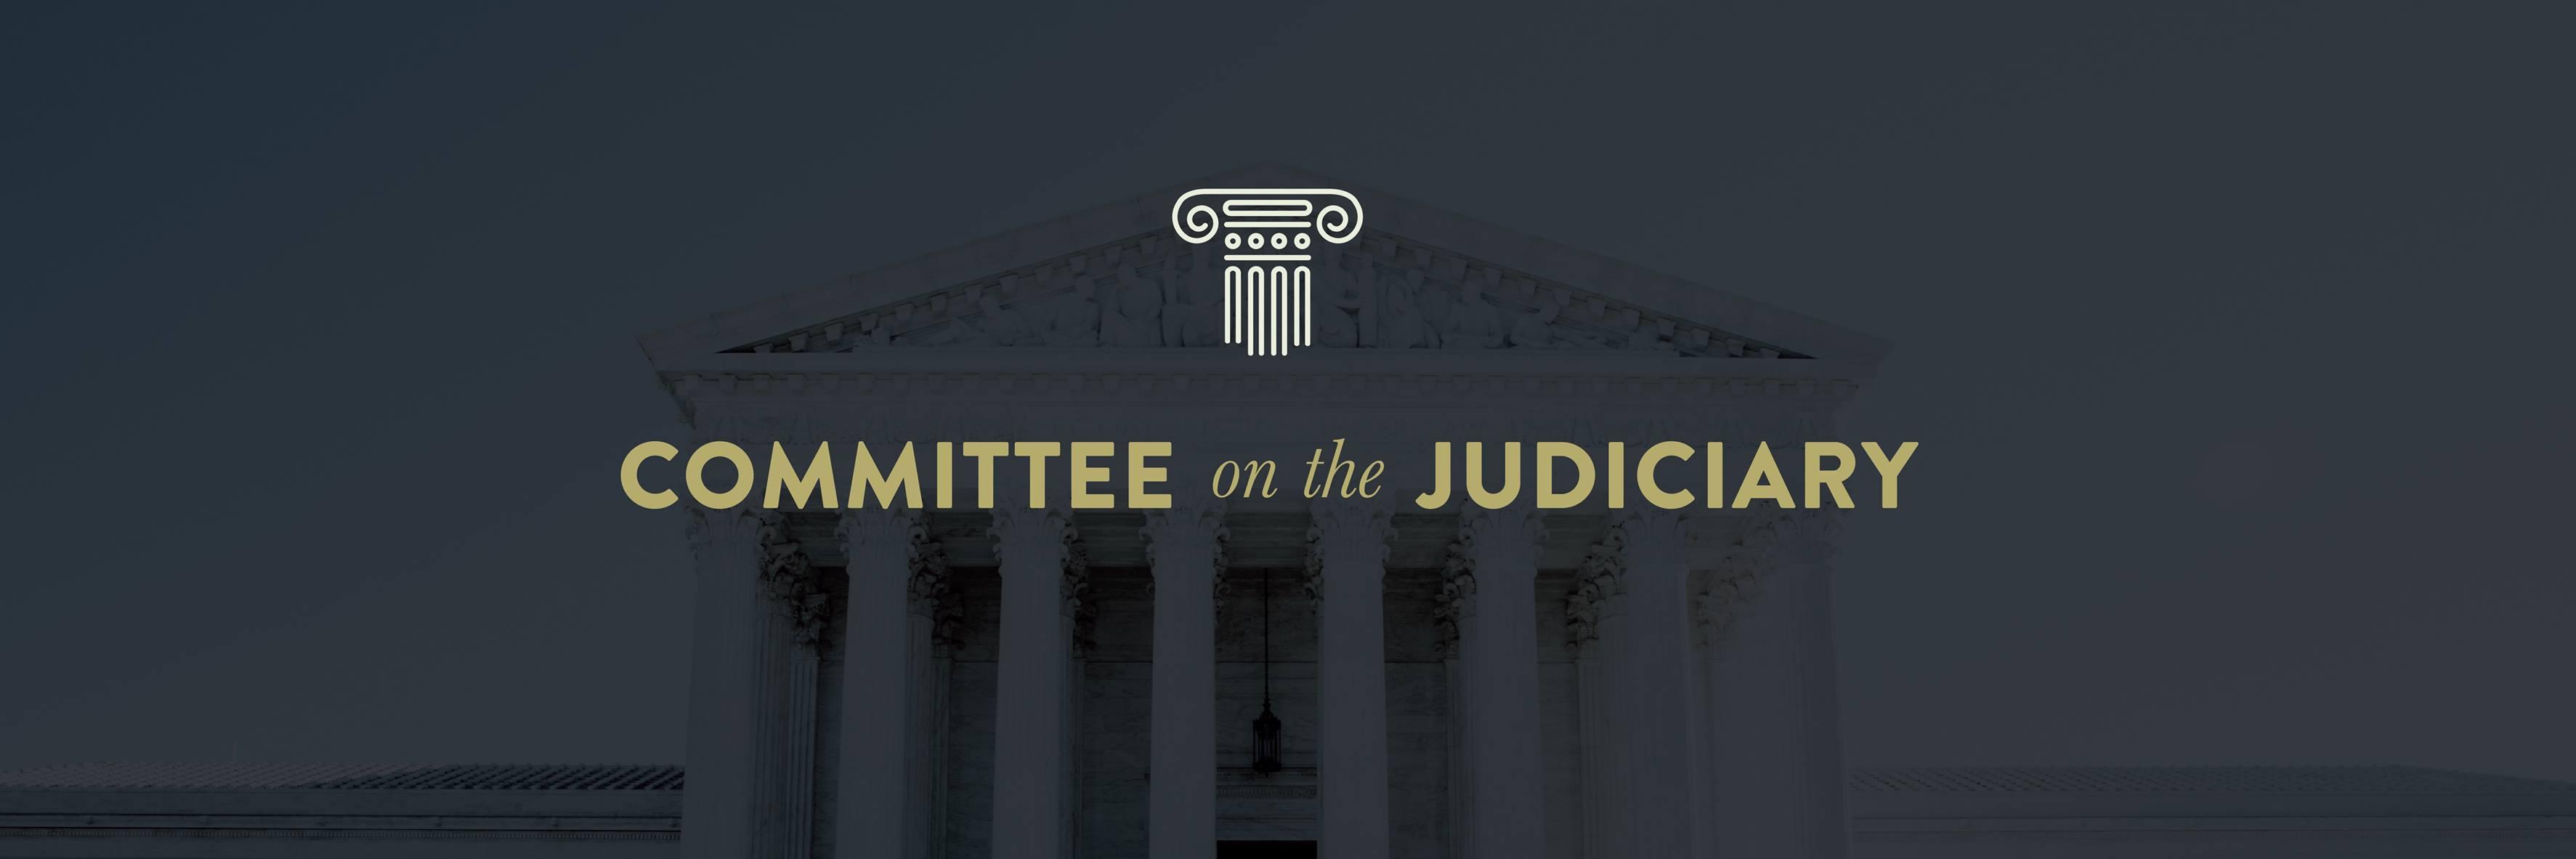 Senate Judiciary Committee Banner